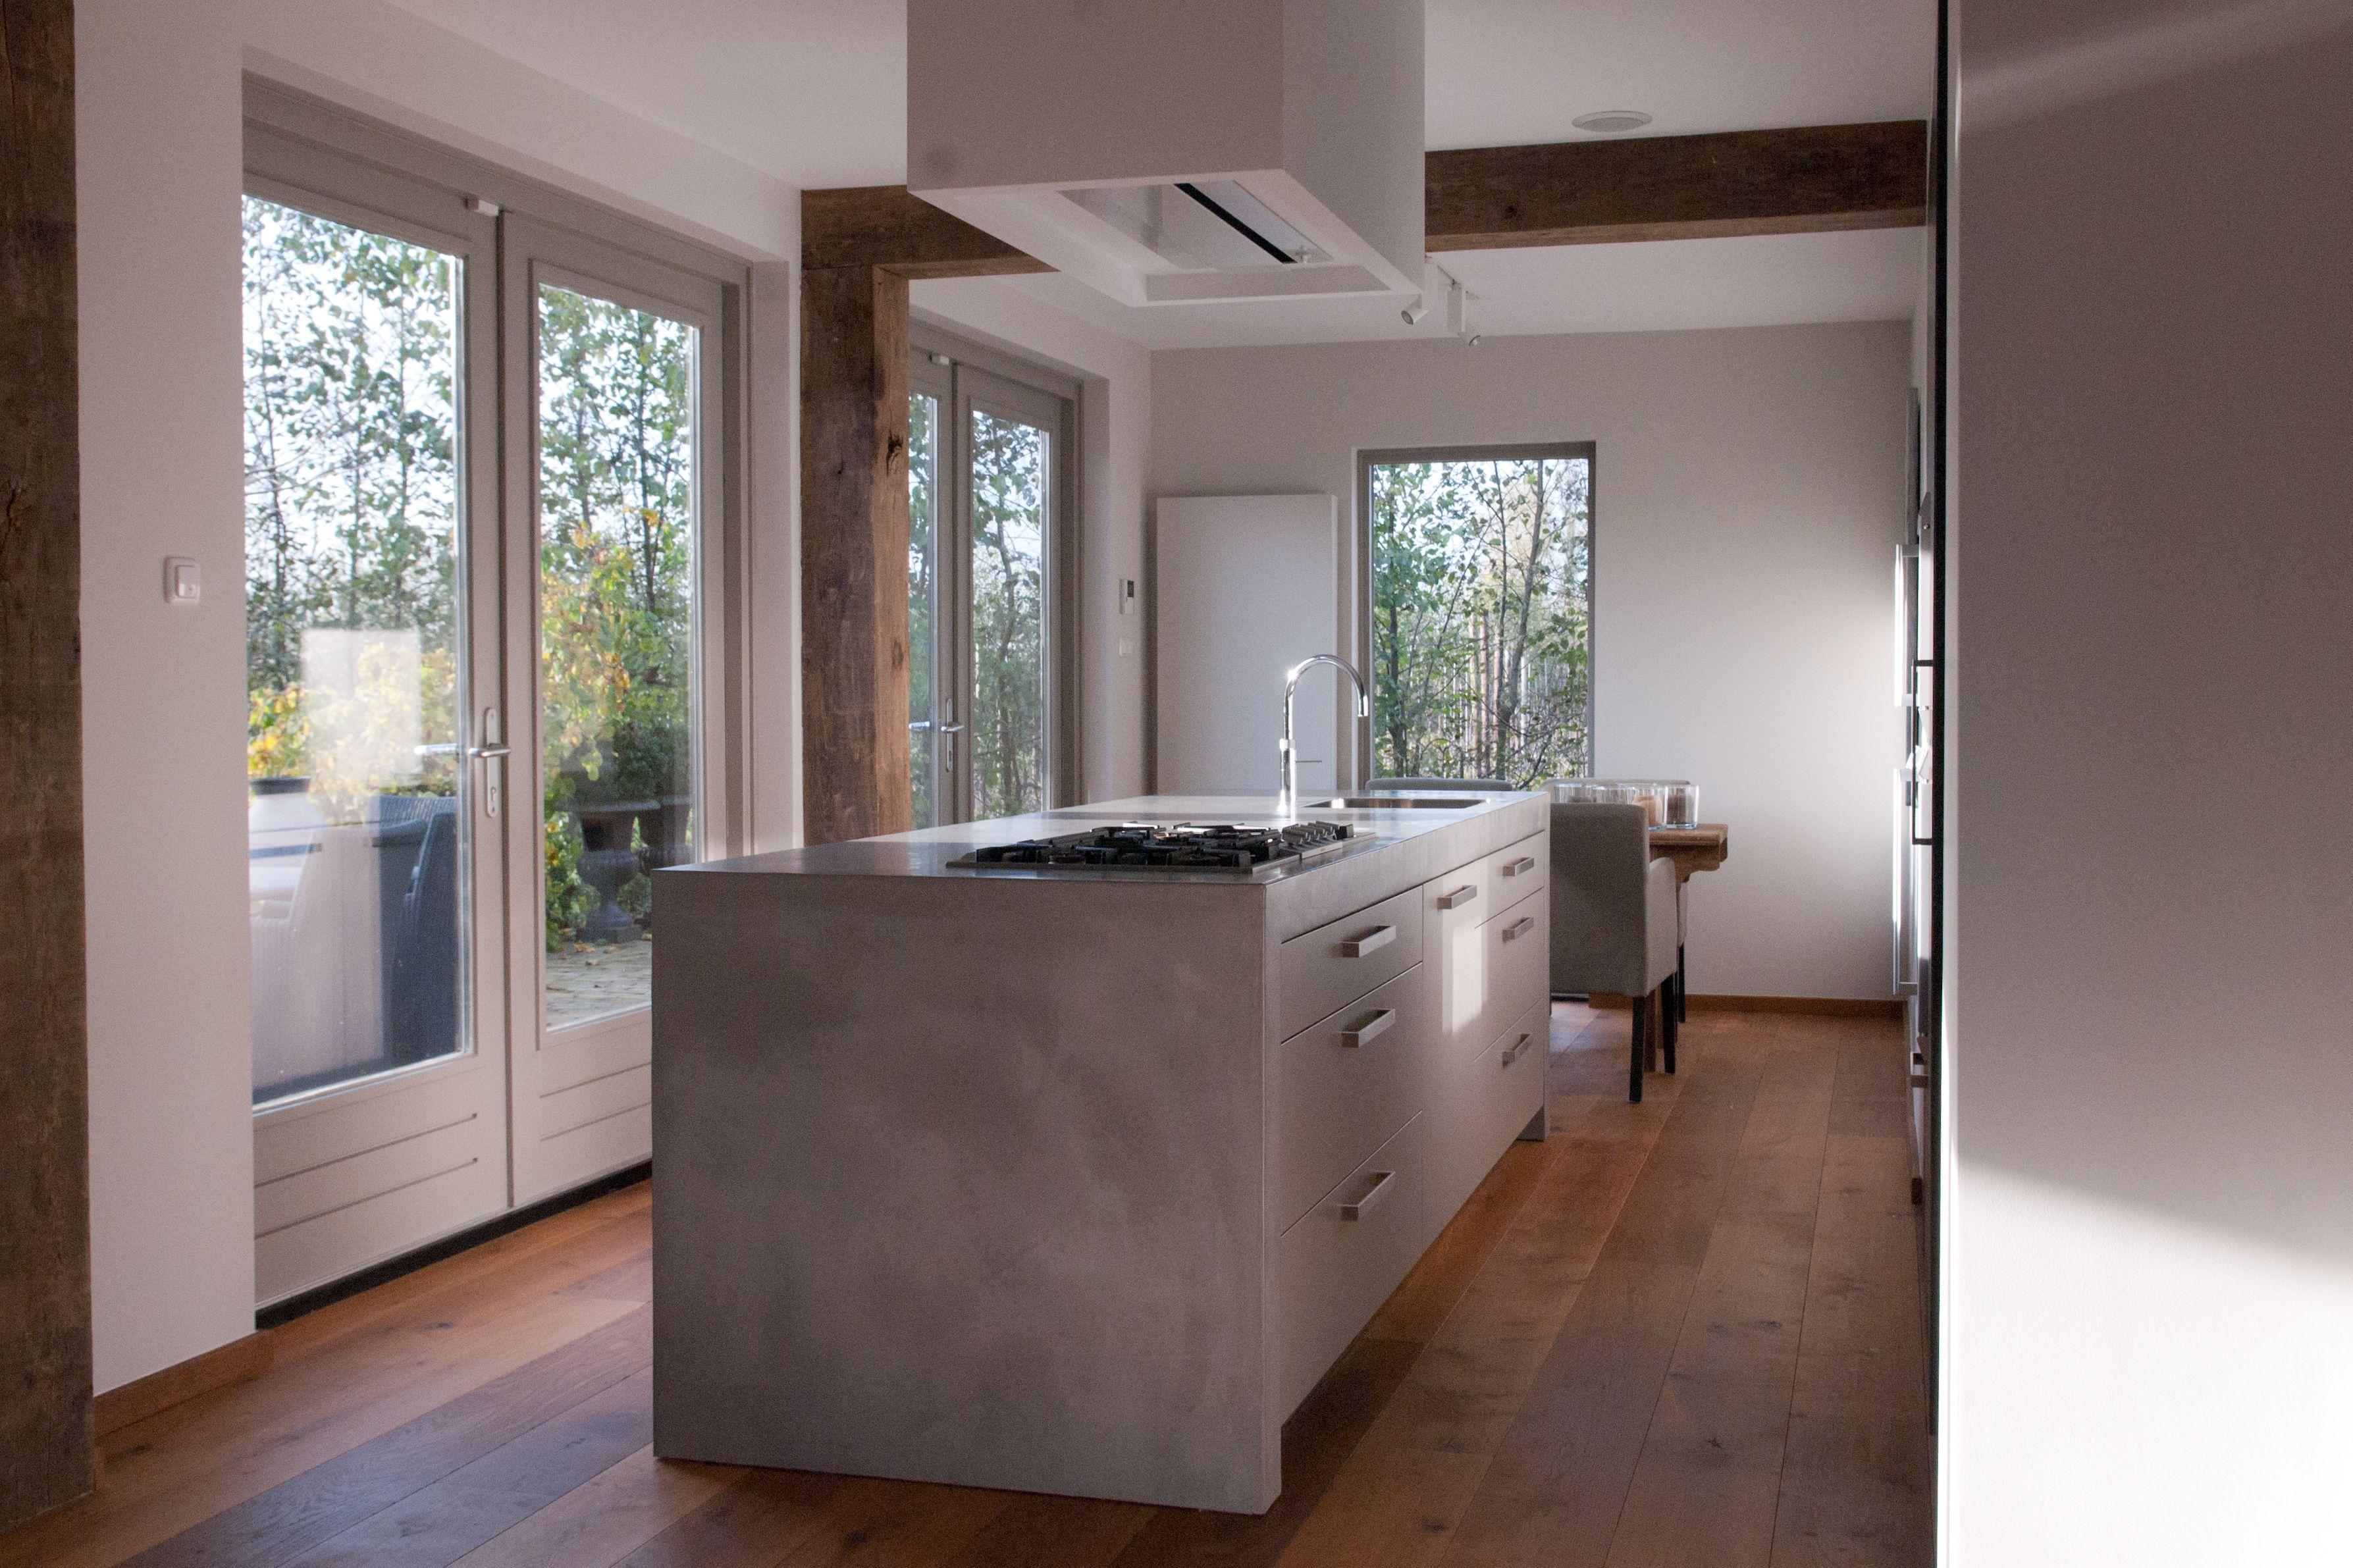 Keukenmeubel verbau betonstuc kleur ijzererts in samenwerking